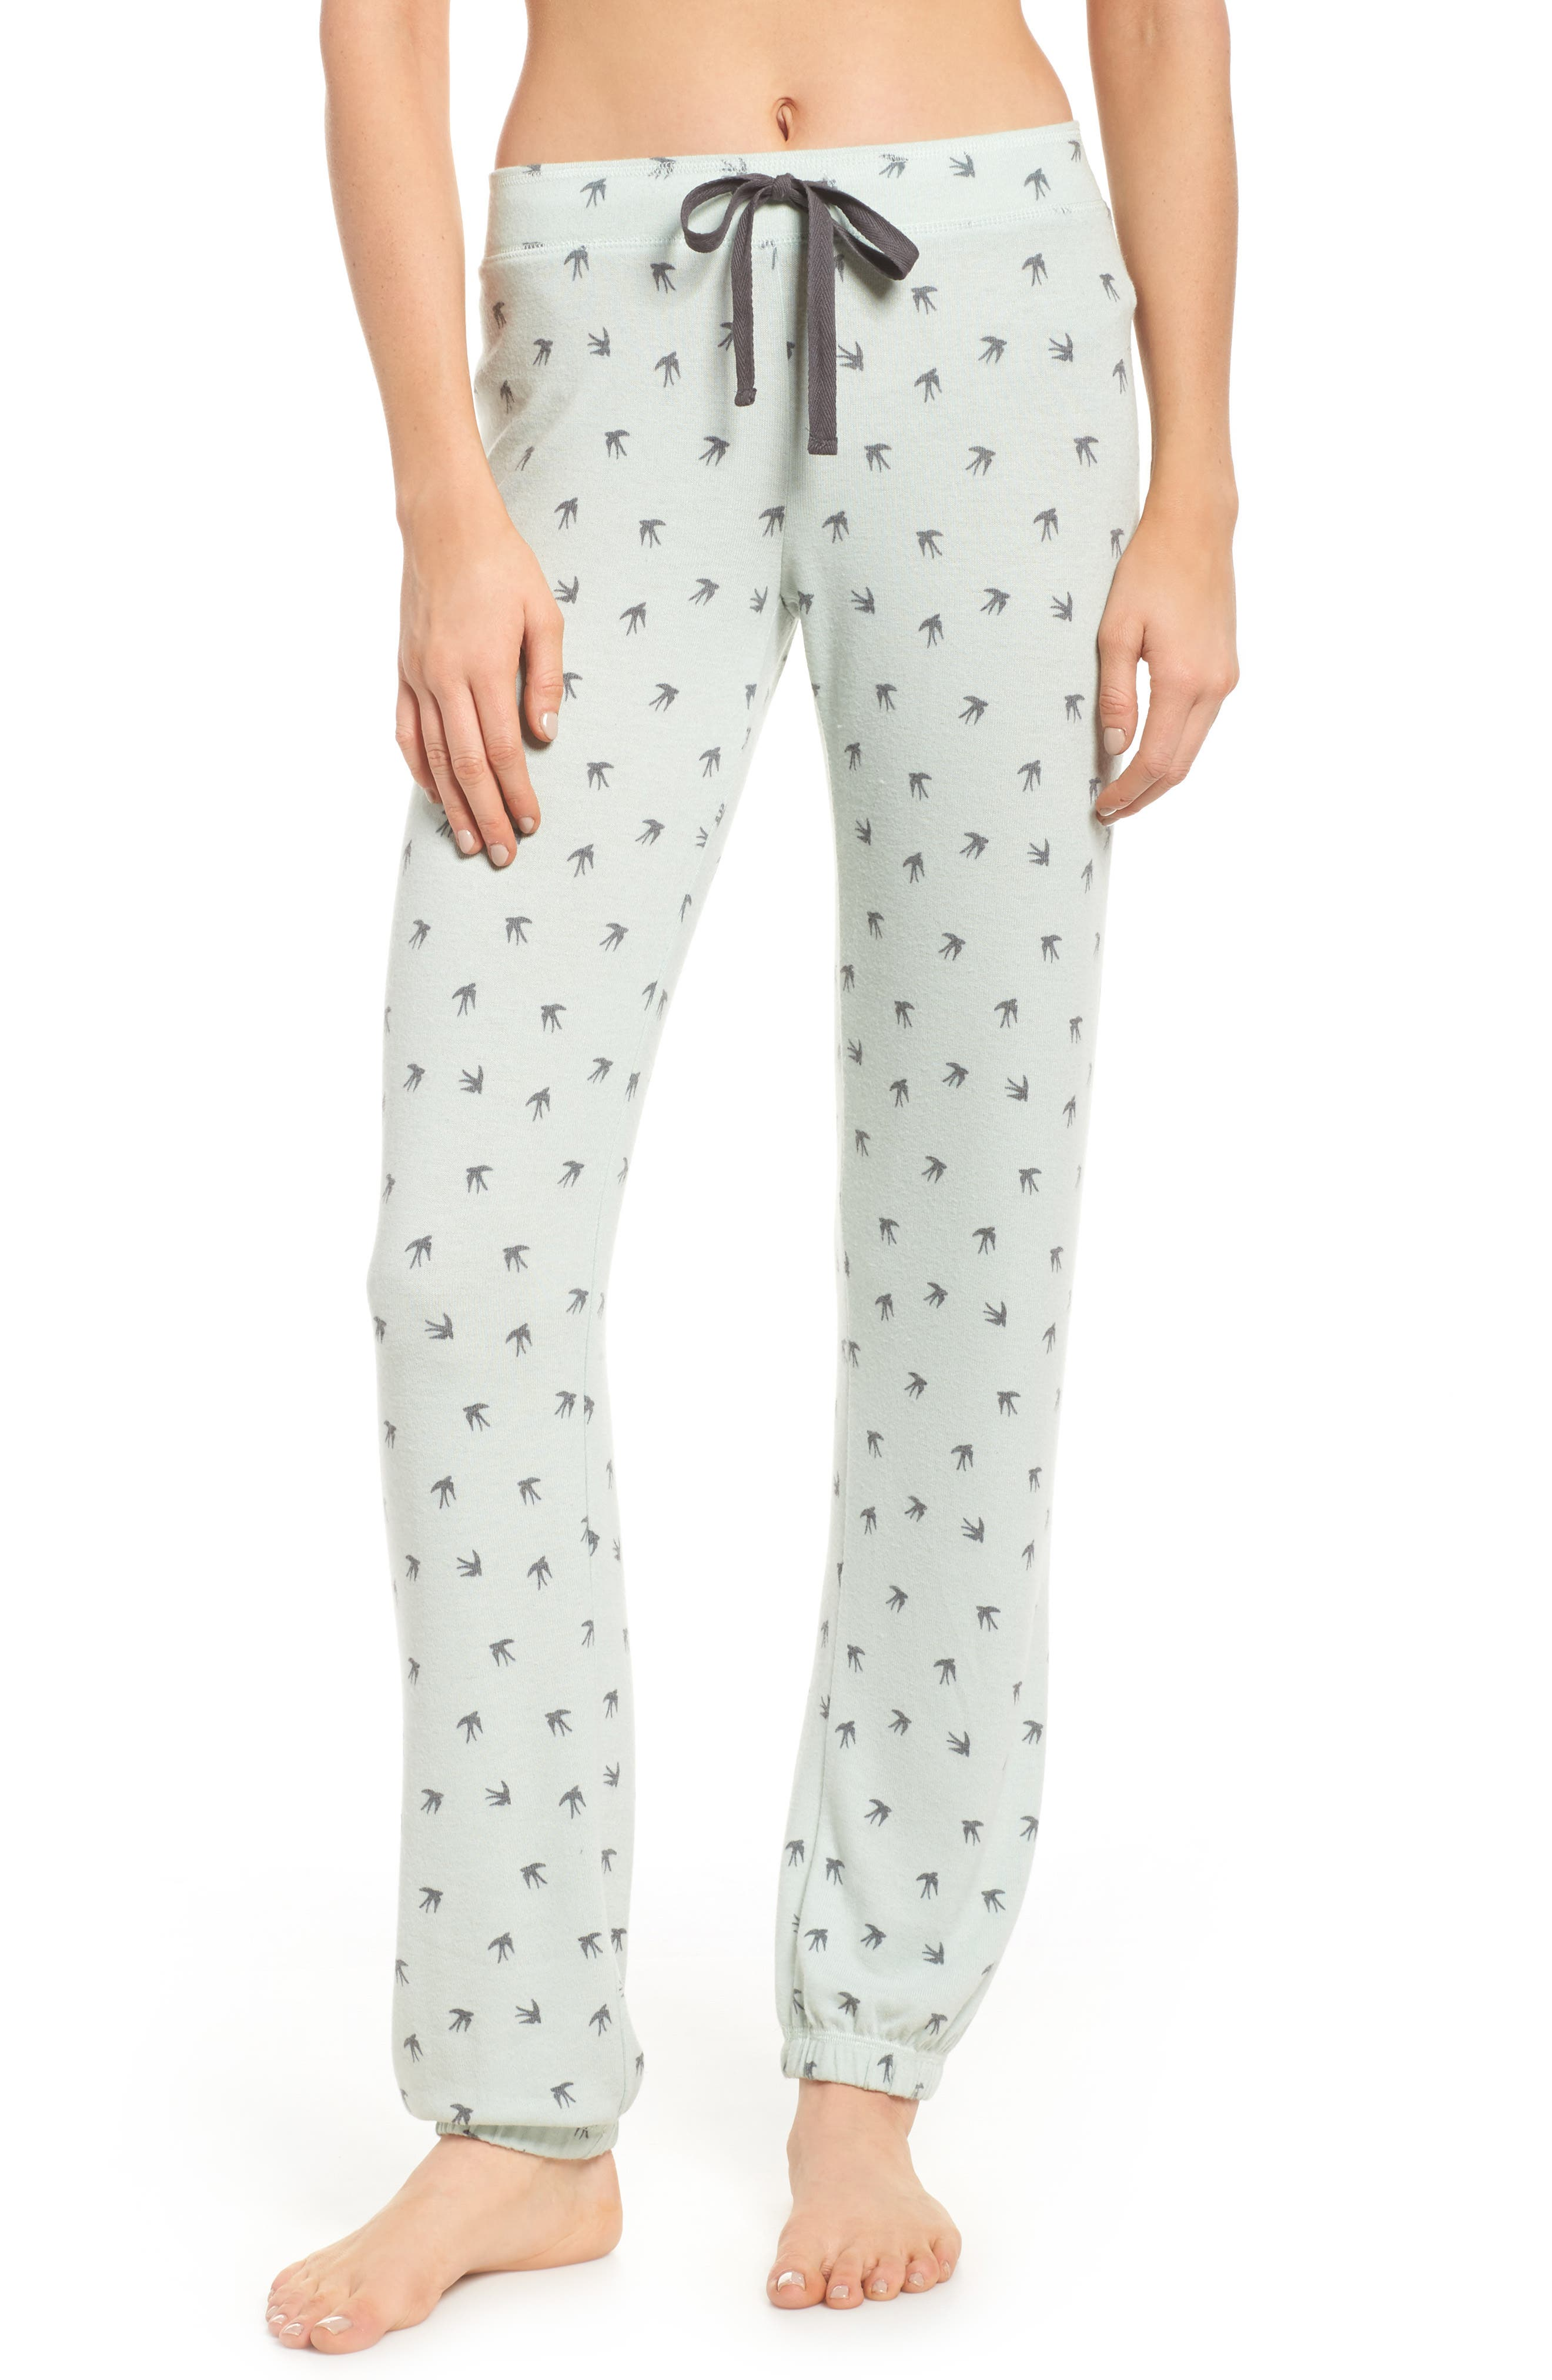 Peachy Pajama Pants,                             Main thumbnail 1, color,                             Seafoam